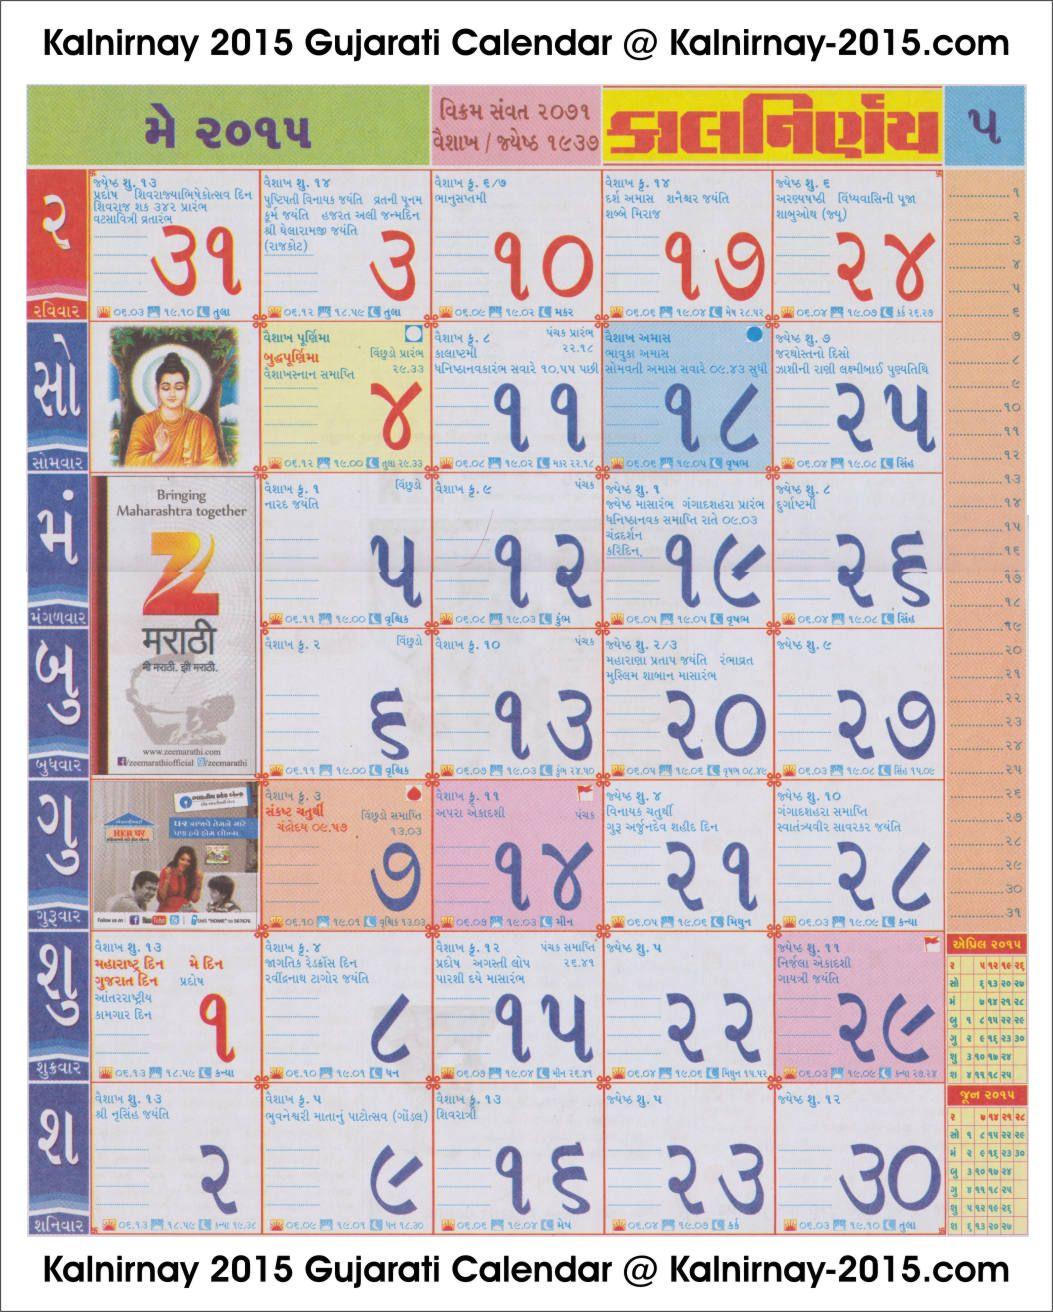 May 2015 Gujarati Kalnirnay Calendar | Calendar, Calendar for Kalnirnay May 2020